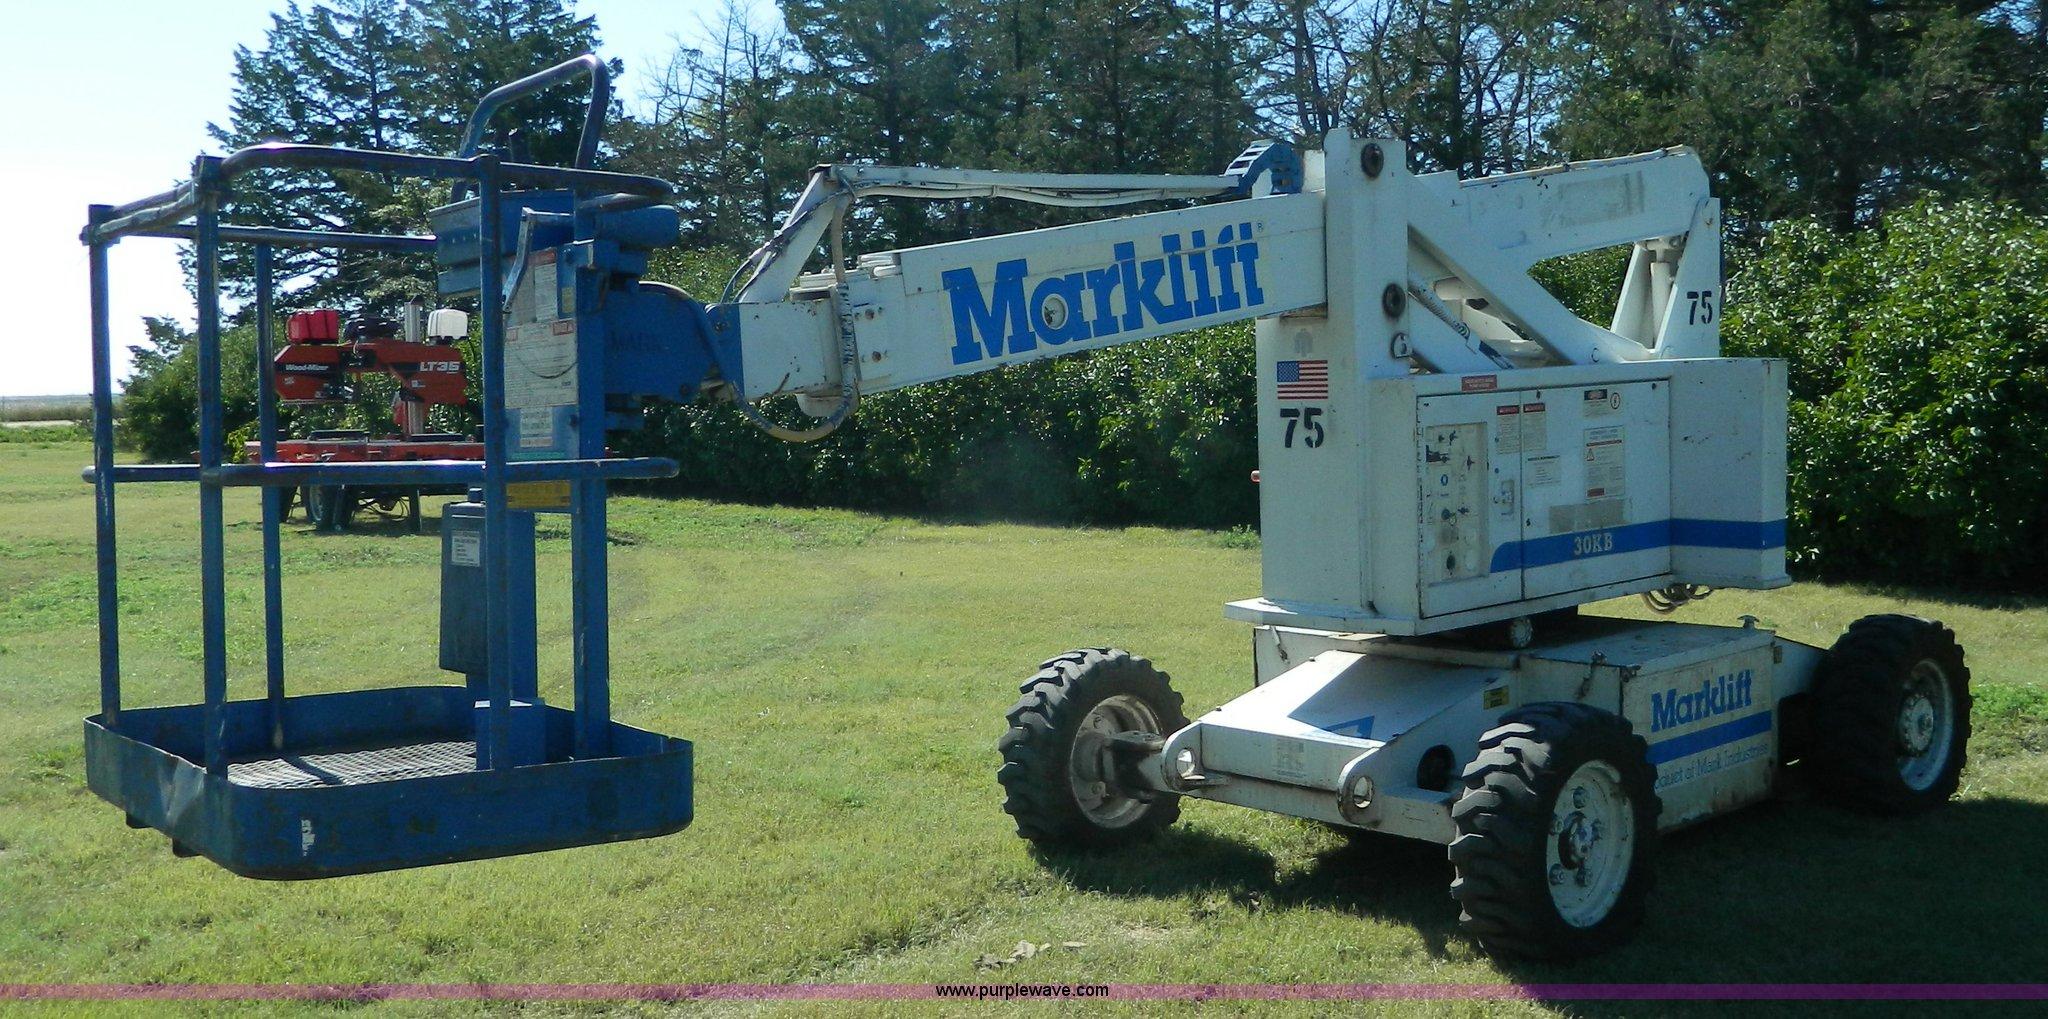 Mark Lift 30kb Boom Item J5123 Sold September 15 C Marklift Wiring Diagrams Full Size In New Window